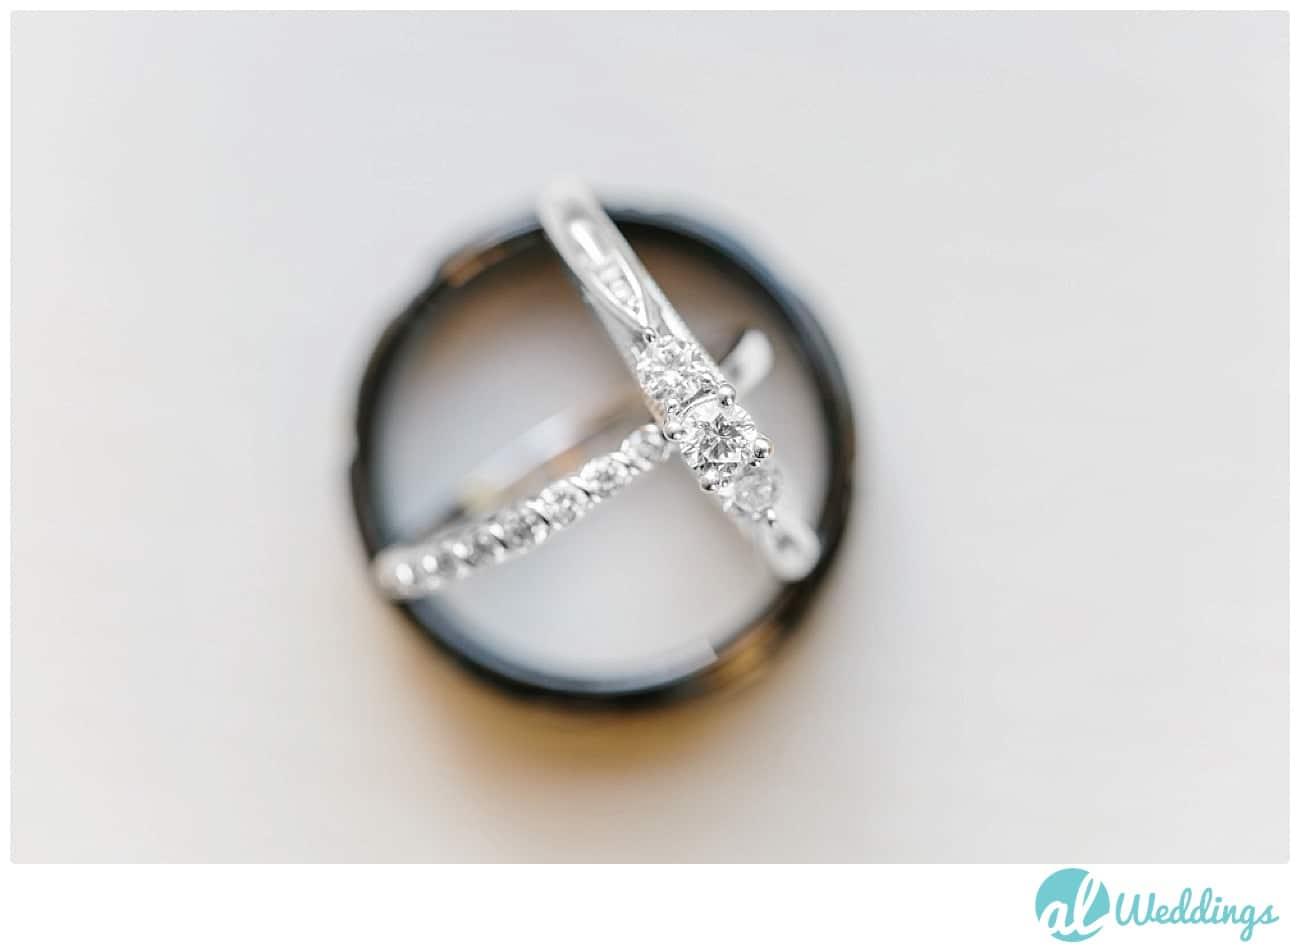 Austin Wedding | Hidden Meadows Vineyard | Alabama Wedding Photographer-15.jpg